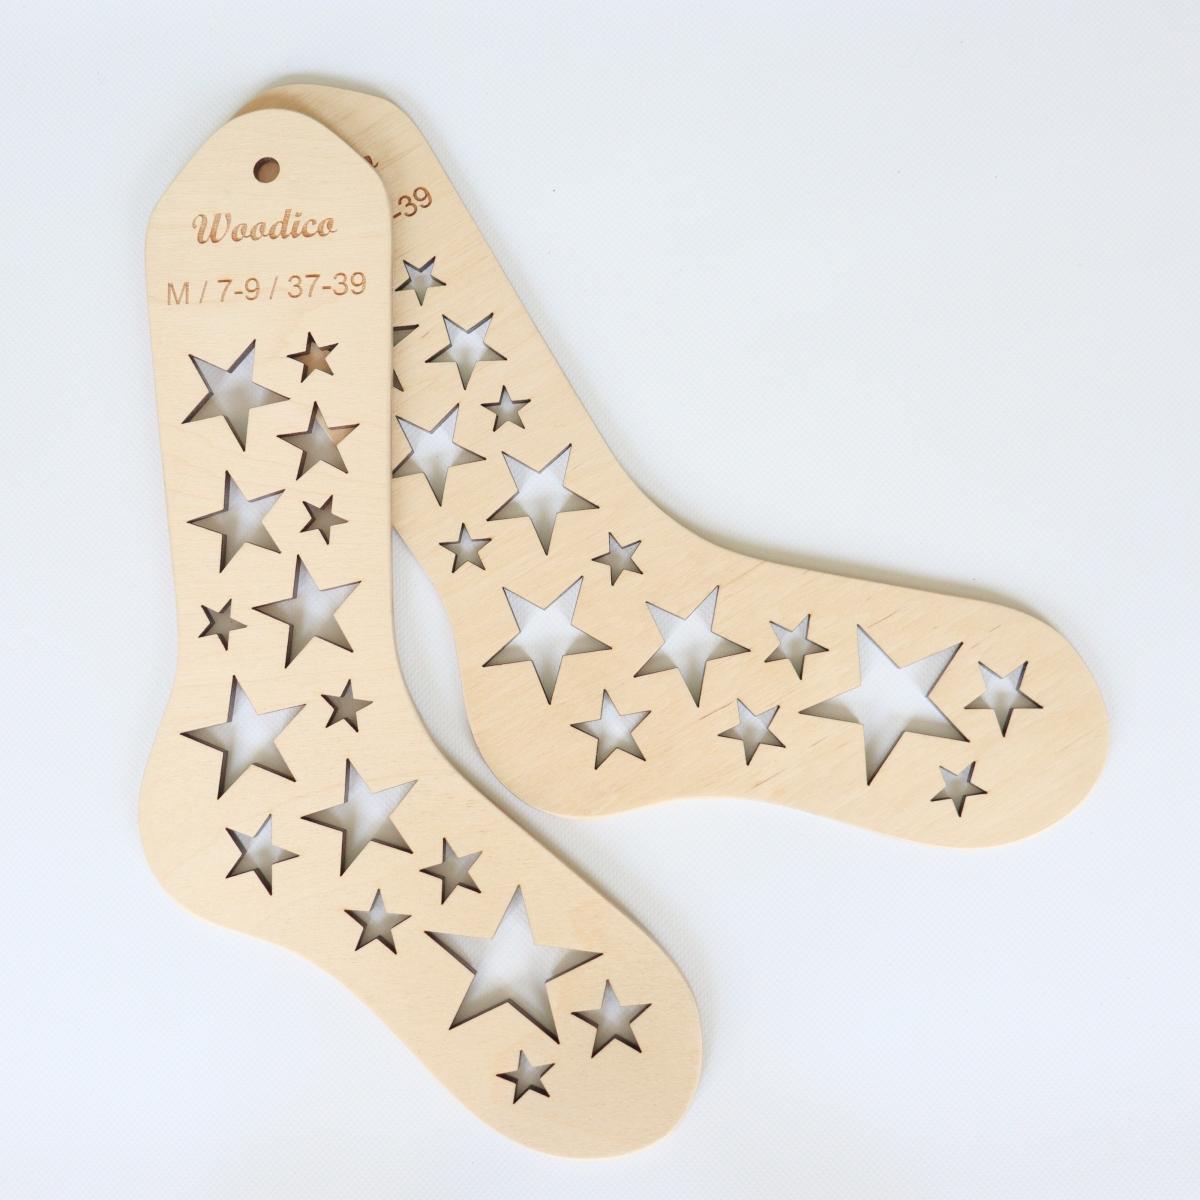 woodico.pro wooden sock blockers stars 7 1200x1200 - Wooden sock blockers / Stars